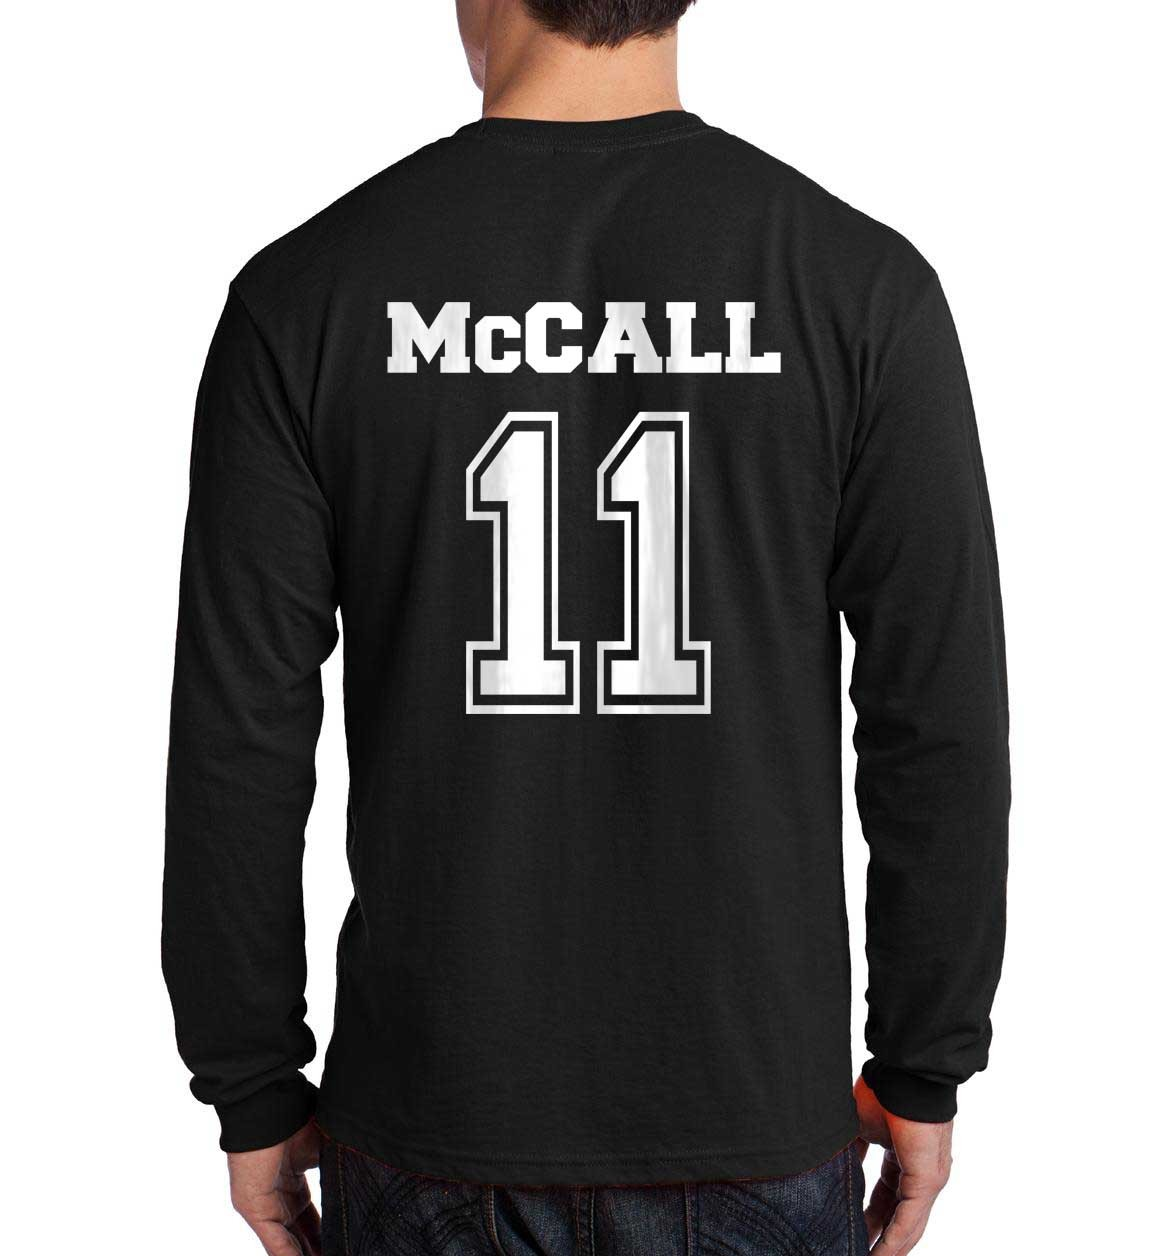 MCCALL 11 SCOTT  Beacon Hills Lacrosse BACK ONLY Longsleeve Men BLACK - $21.00